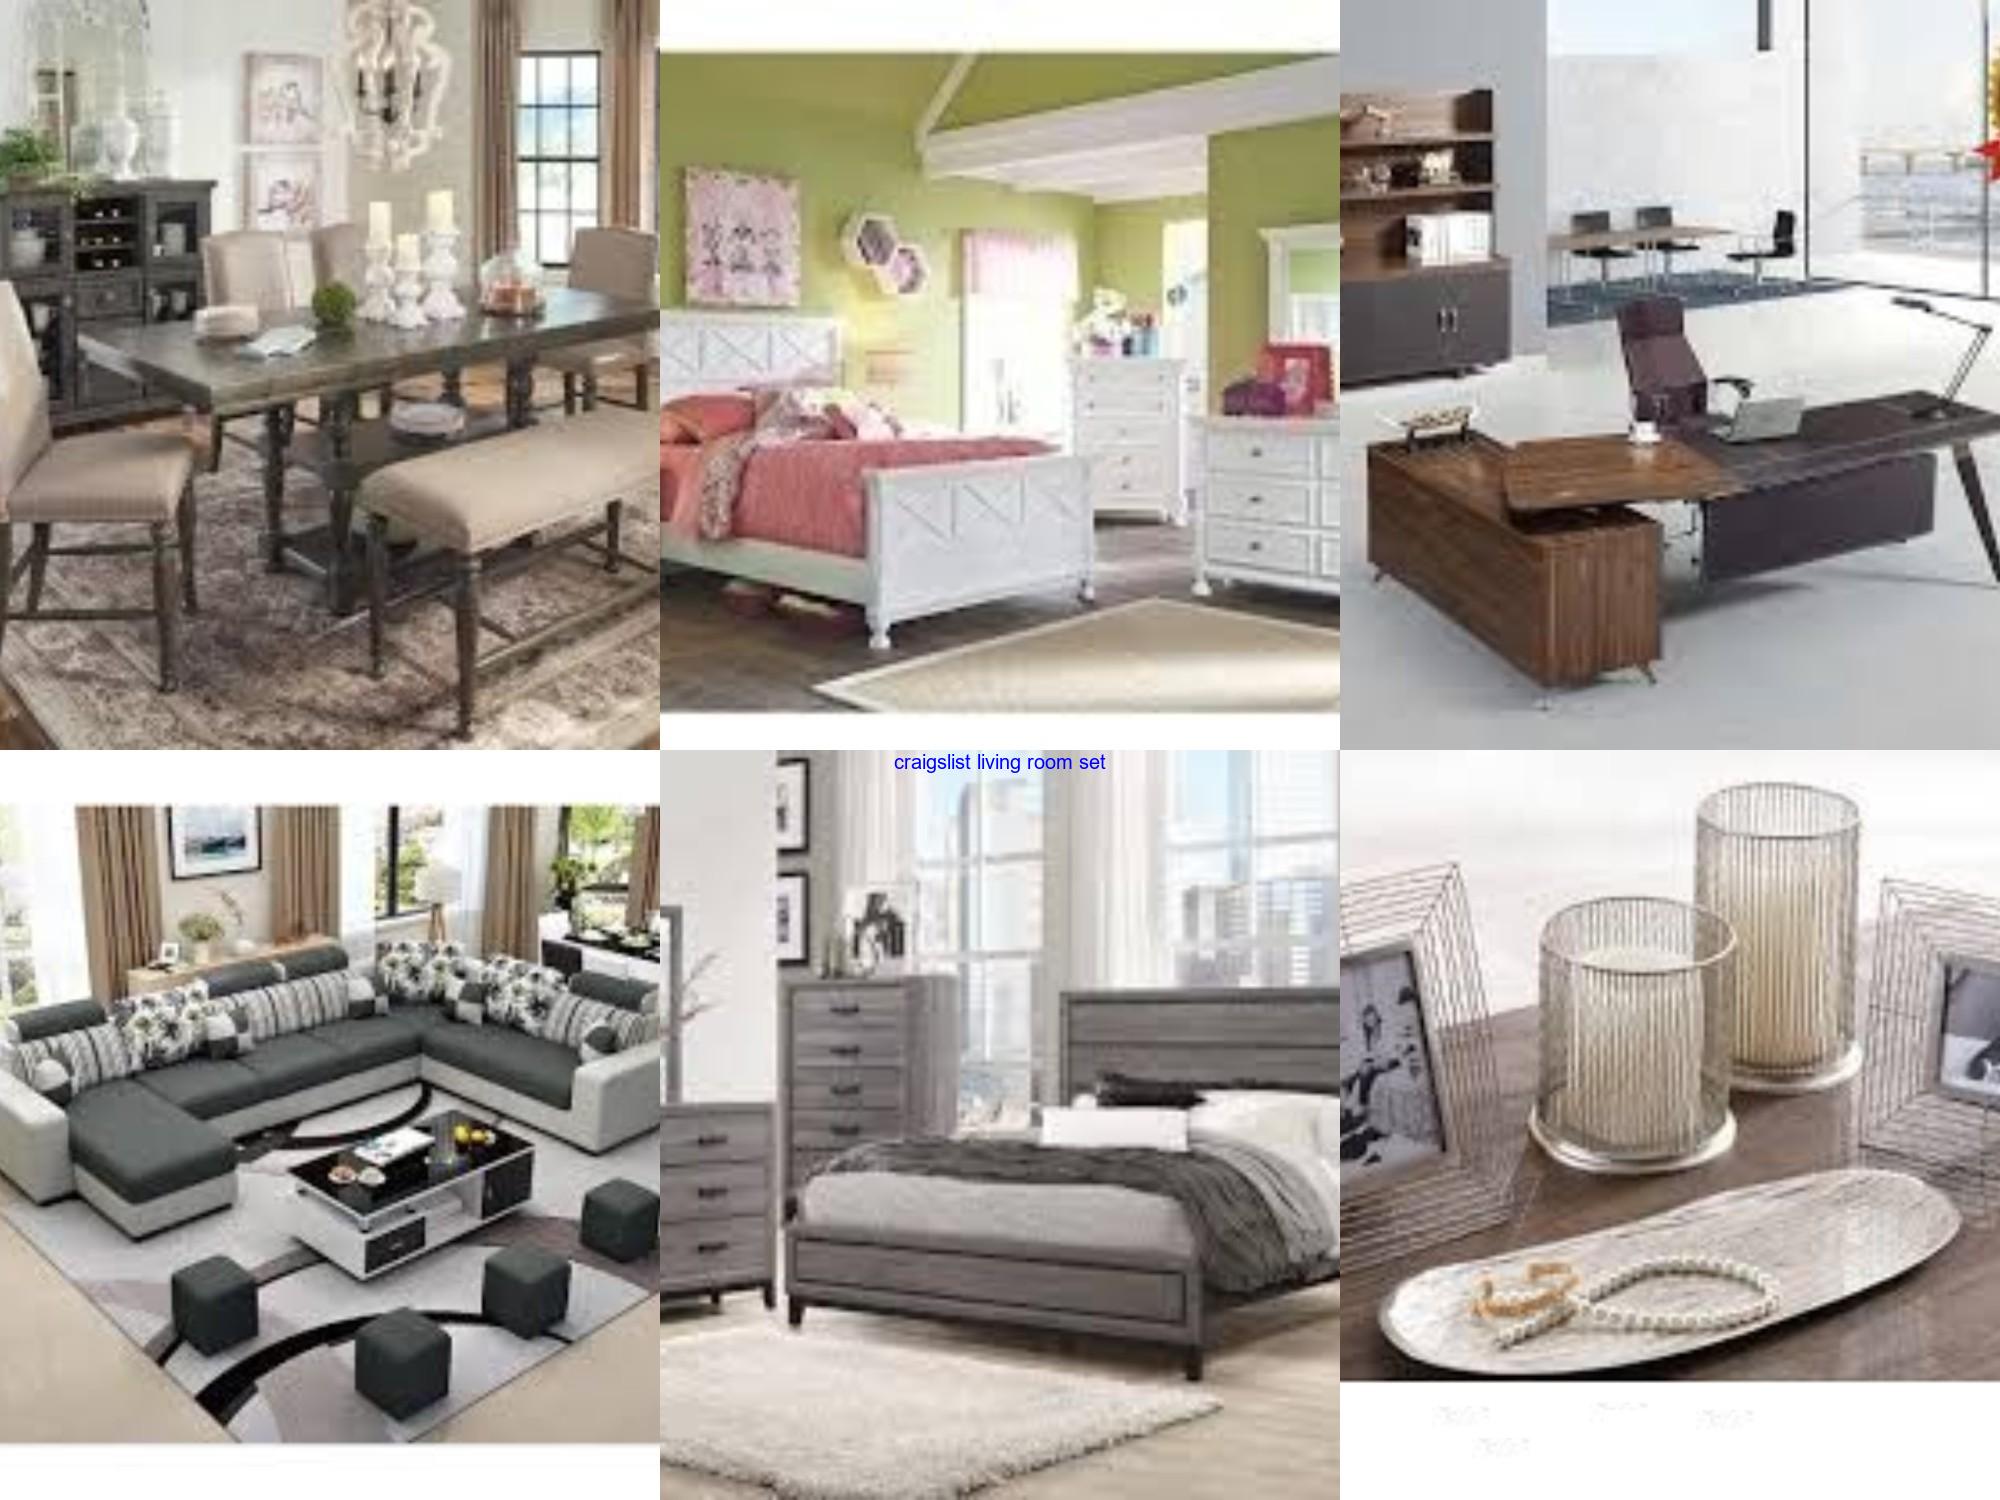 Craigslist Living Room Set